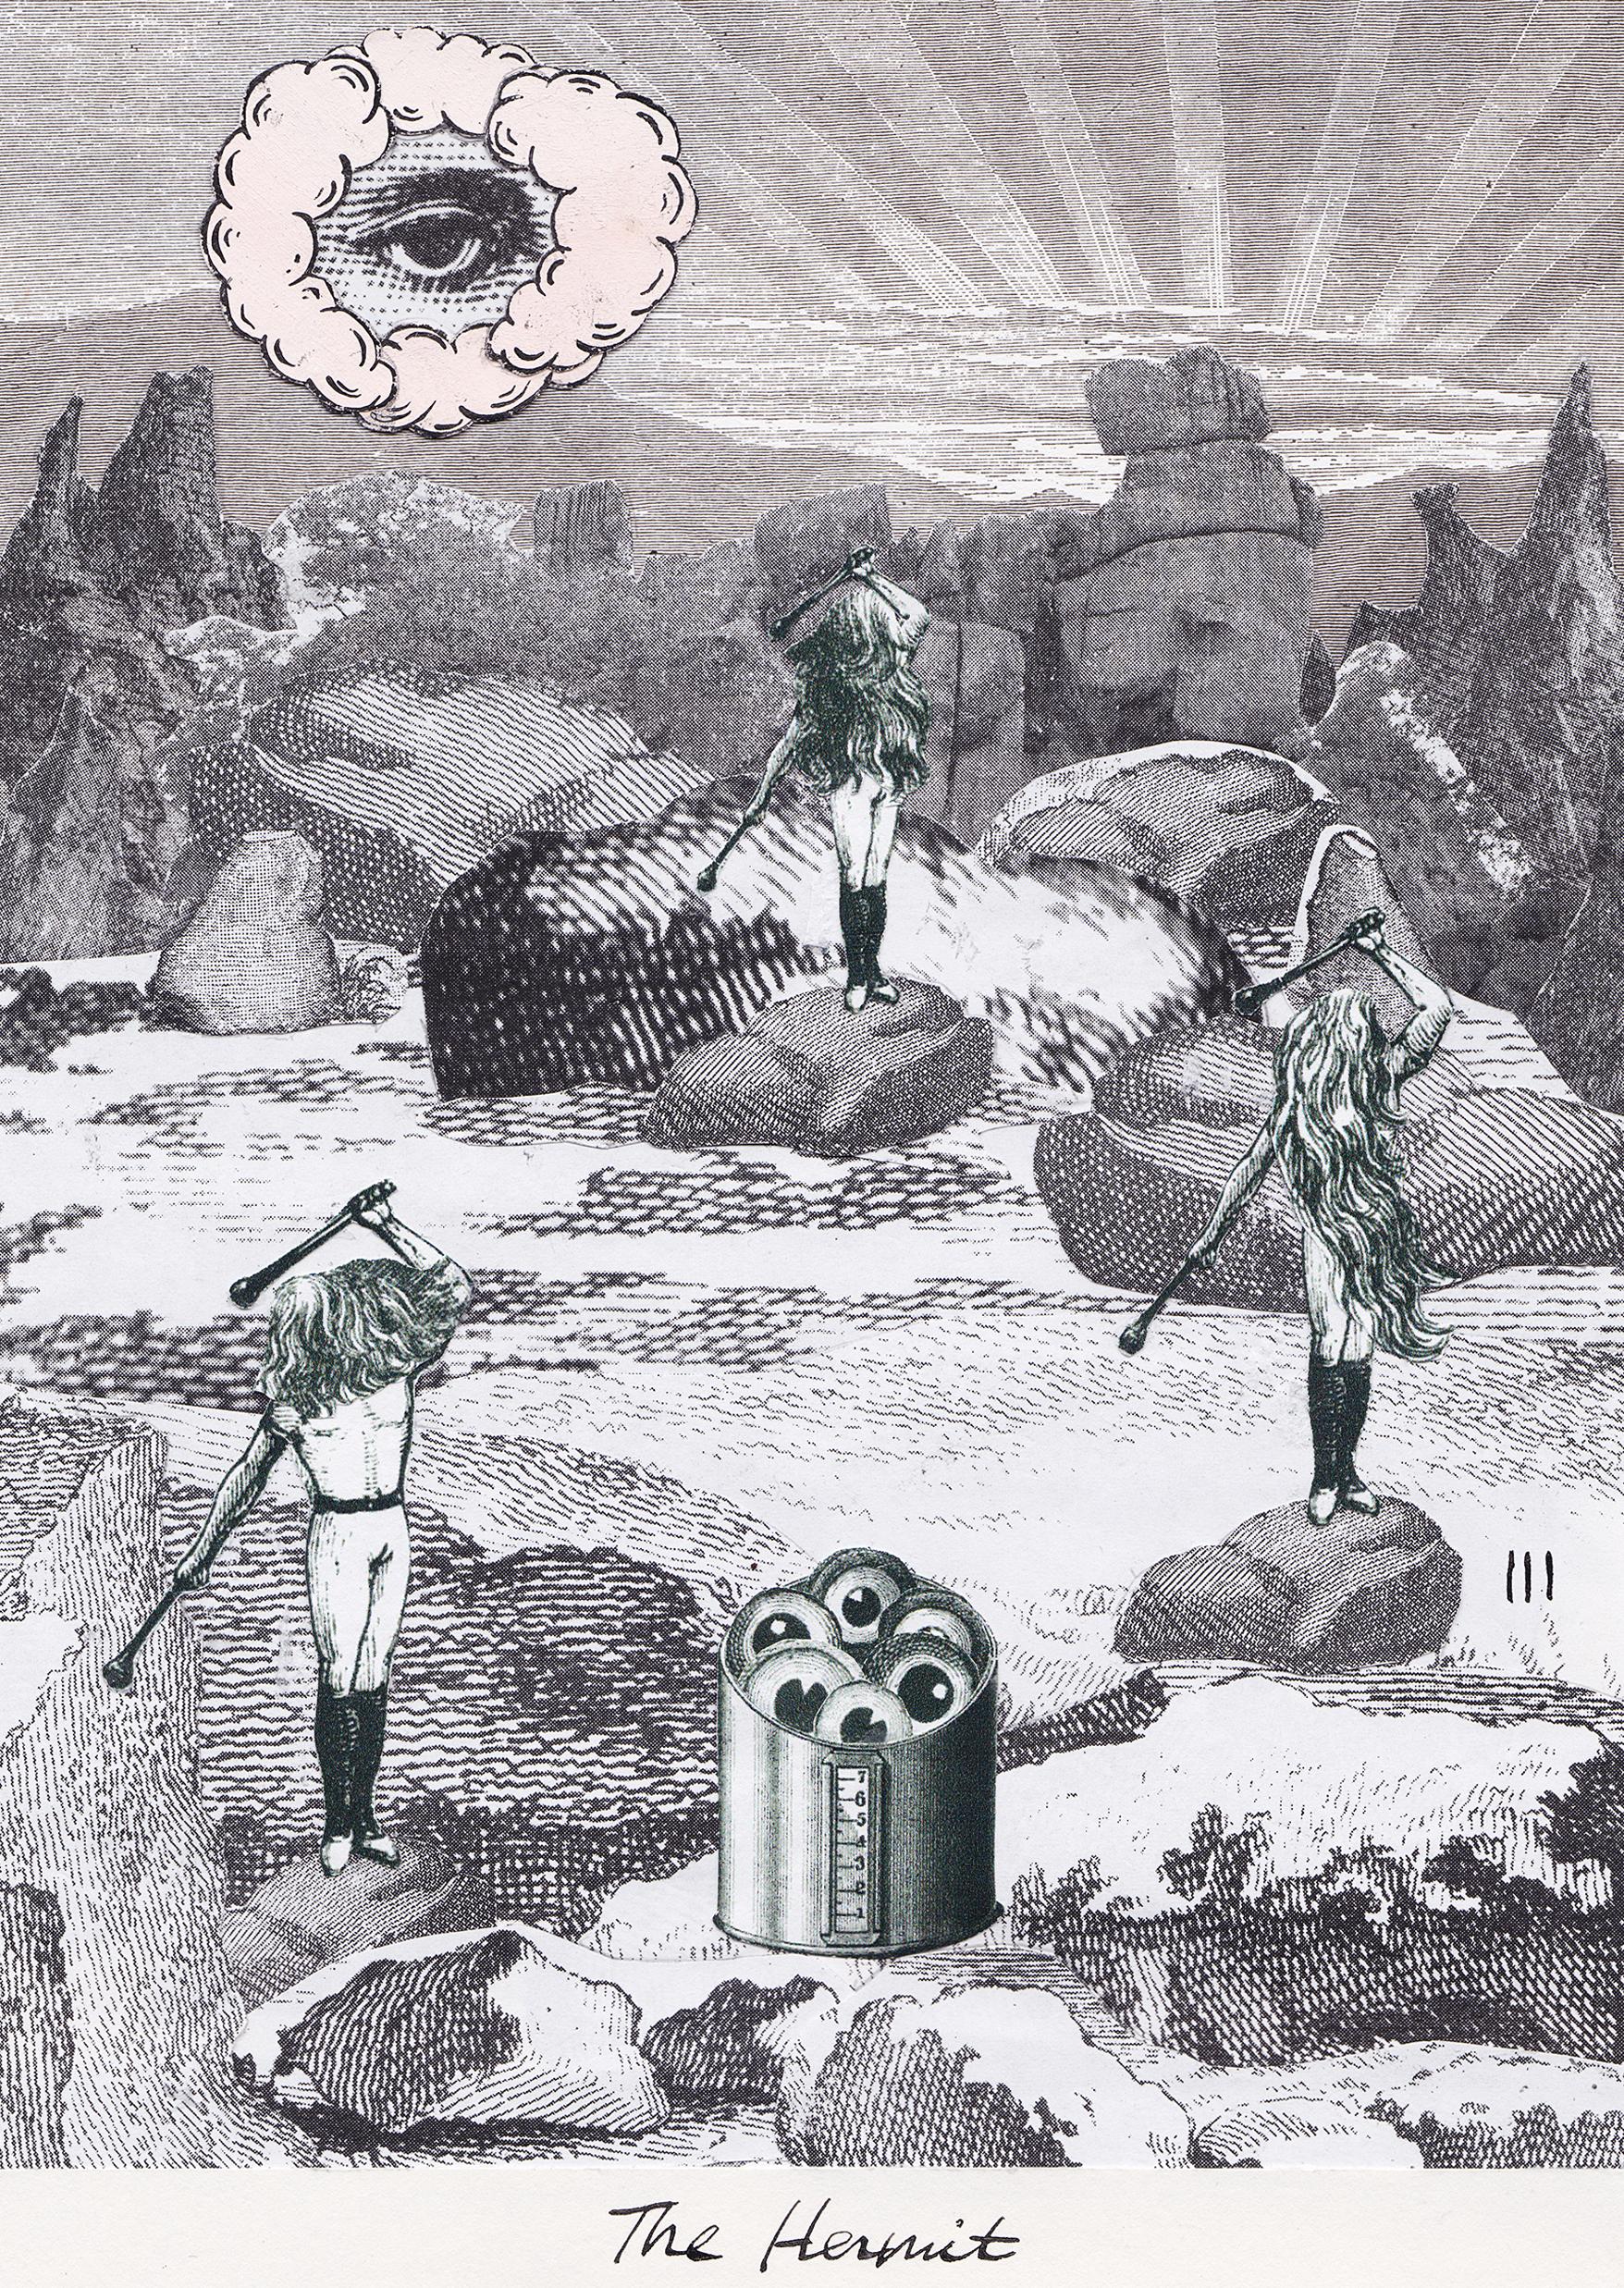 The Hermit, Collage Giclée print on Hahnemühle Photo Rag, 21x14.8cm